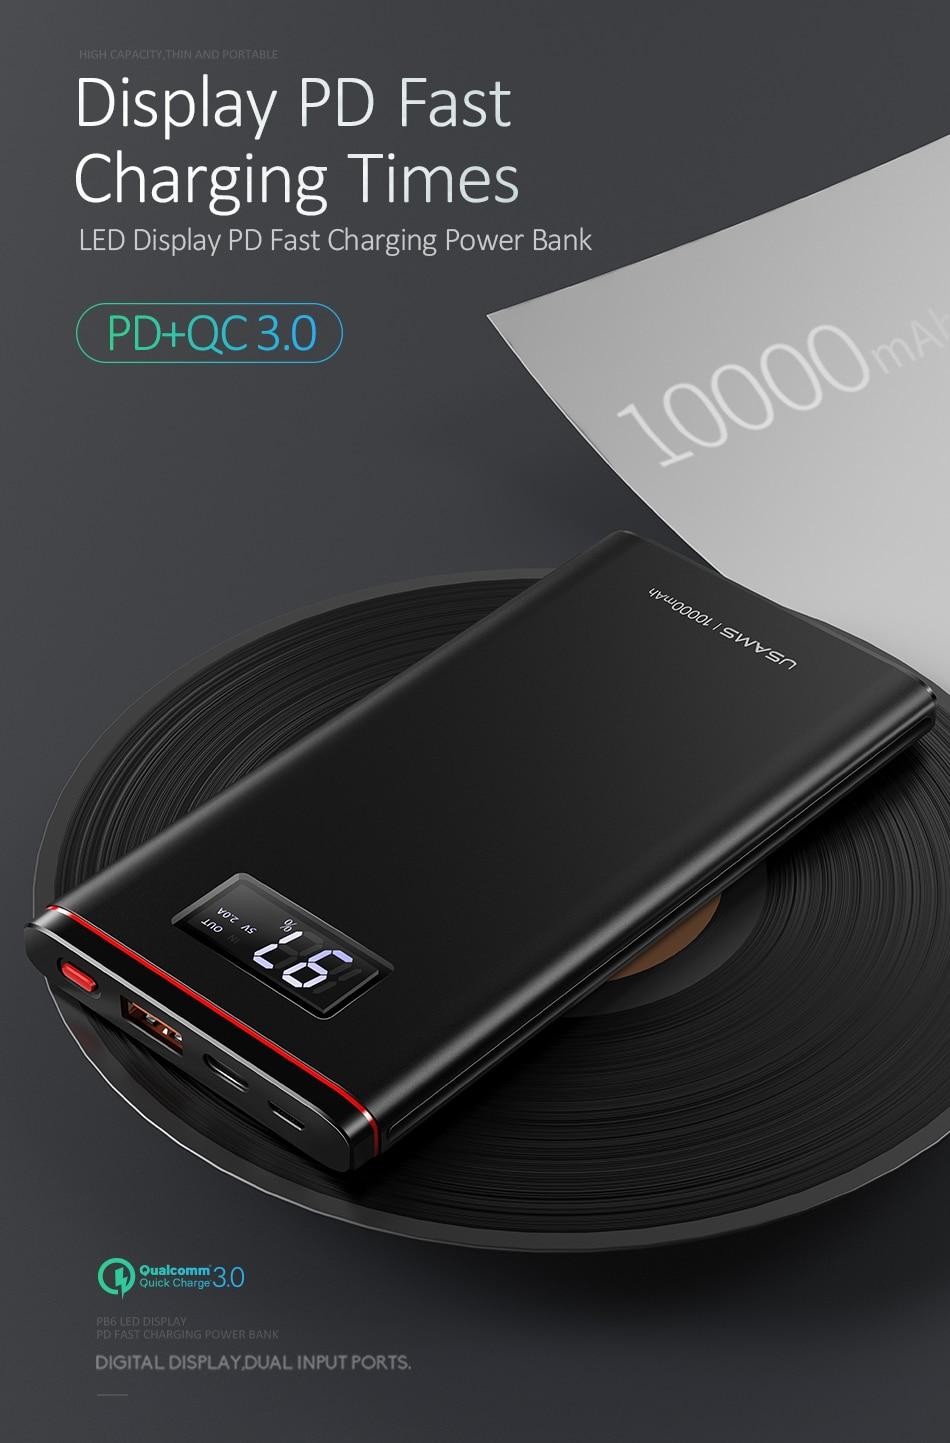 US-CD62-950_01